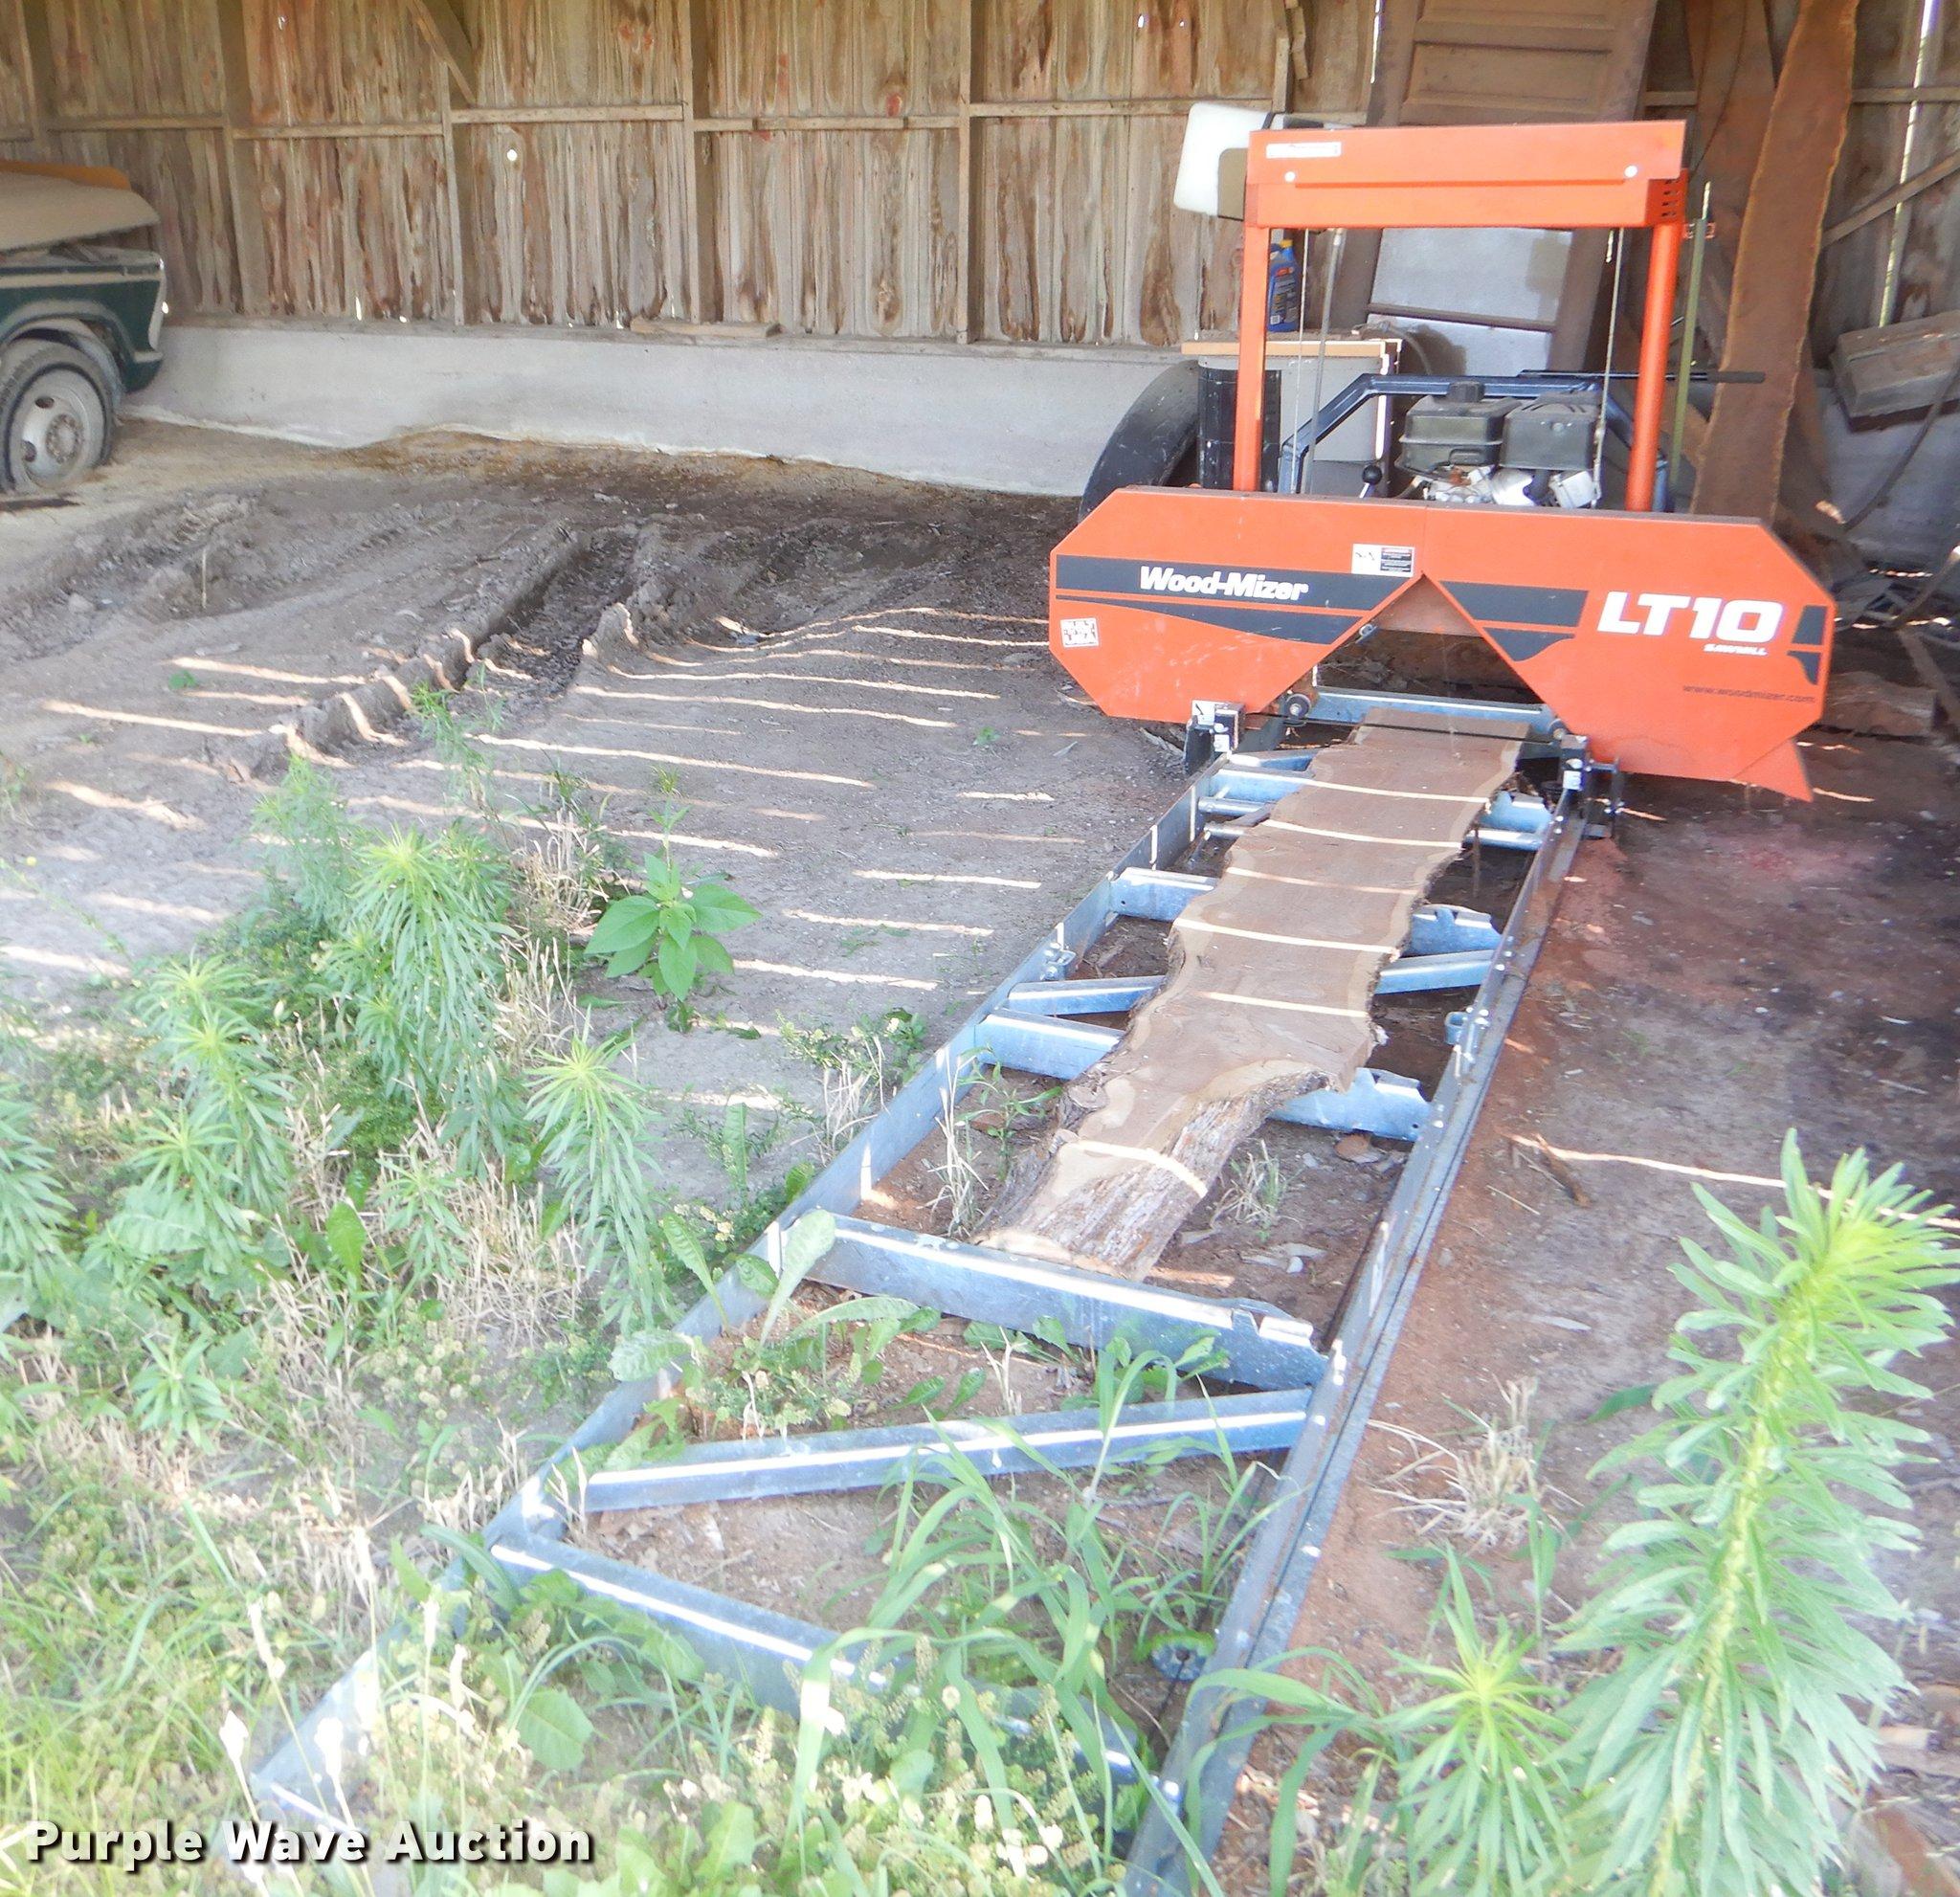 Woodmizer Sawmill For Sale >> Woodmizer Lt10 Sawmill Item Ek9569 Sold August 1 Vehicl